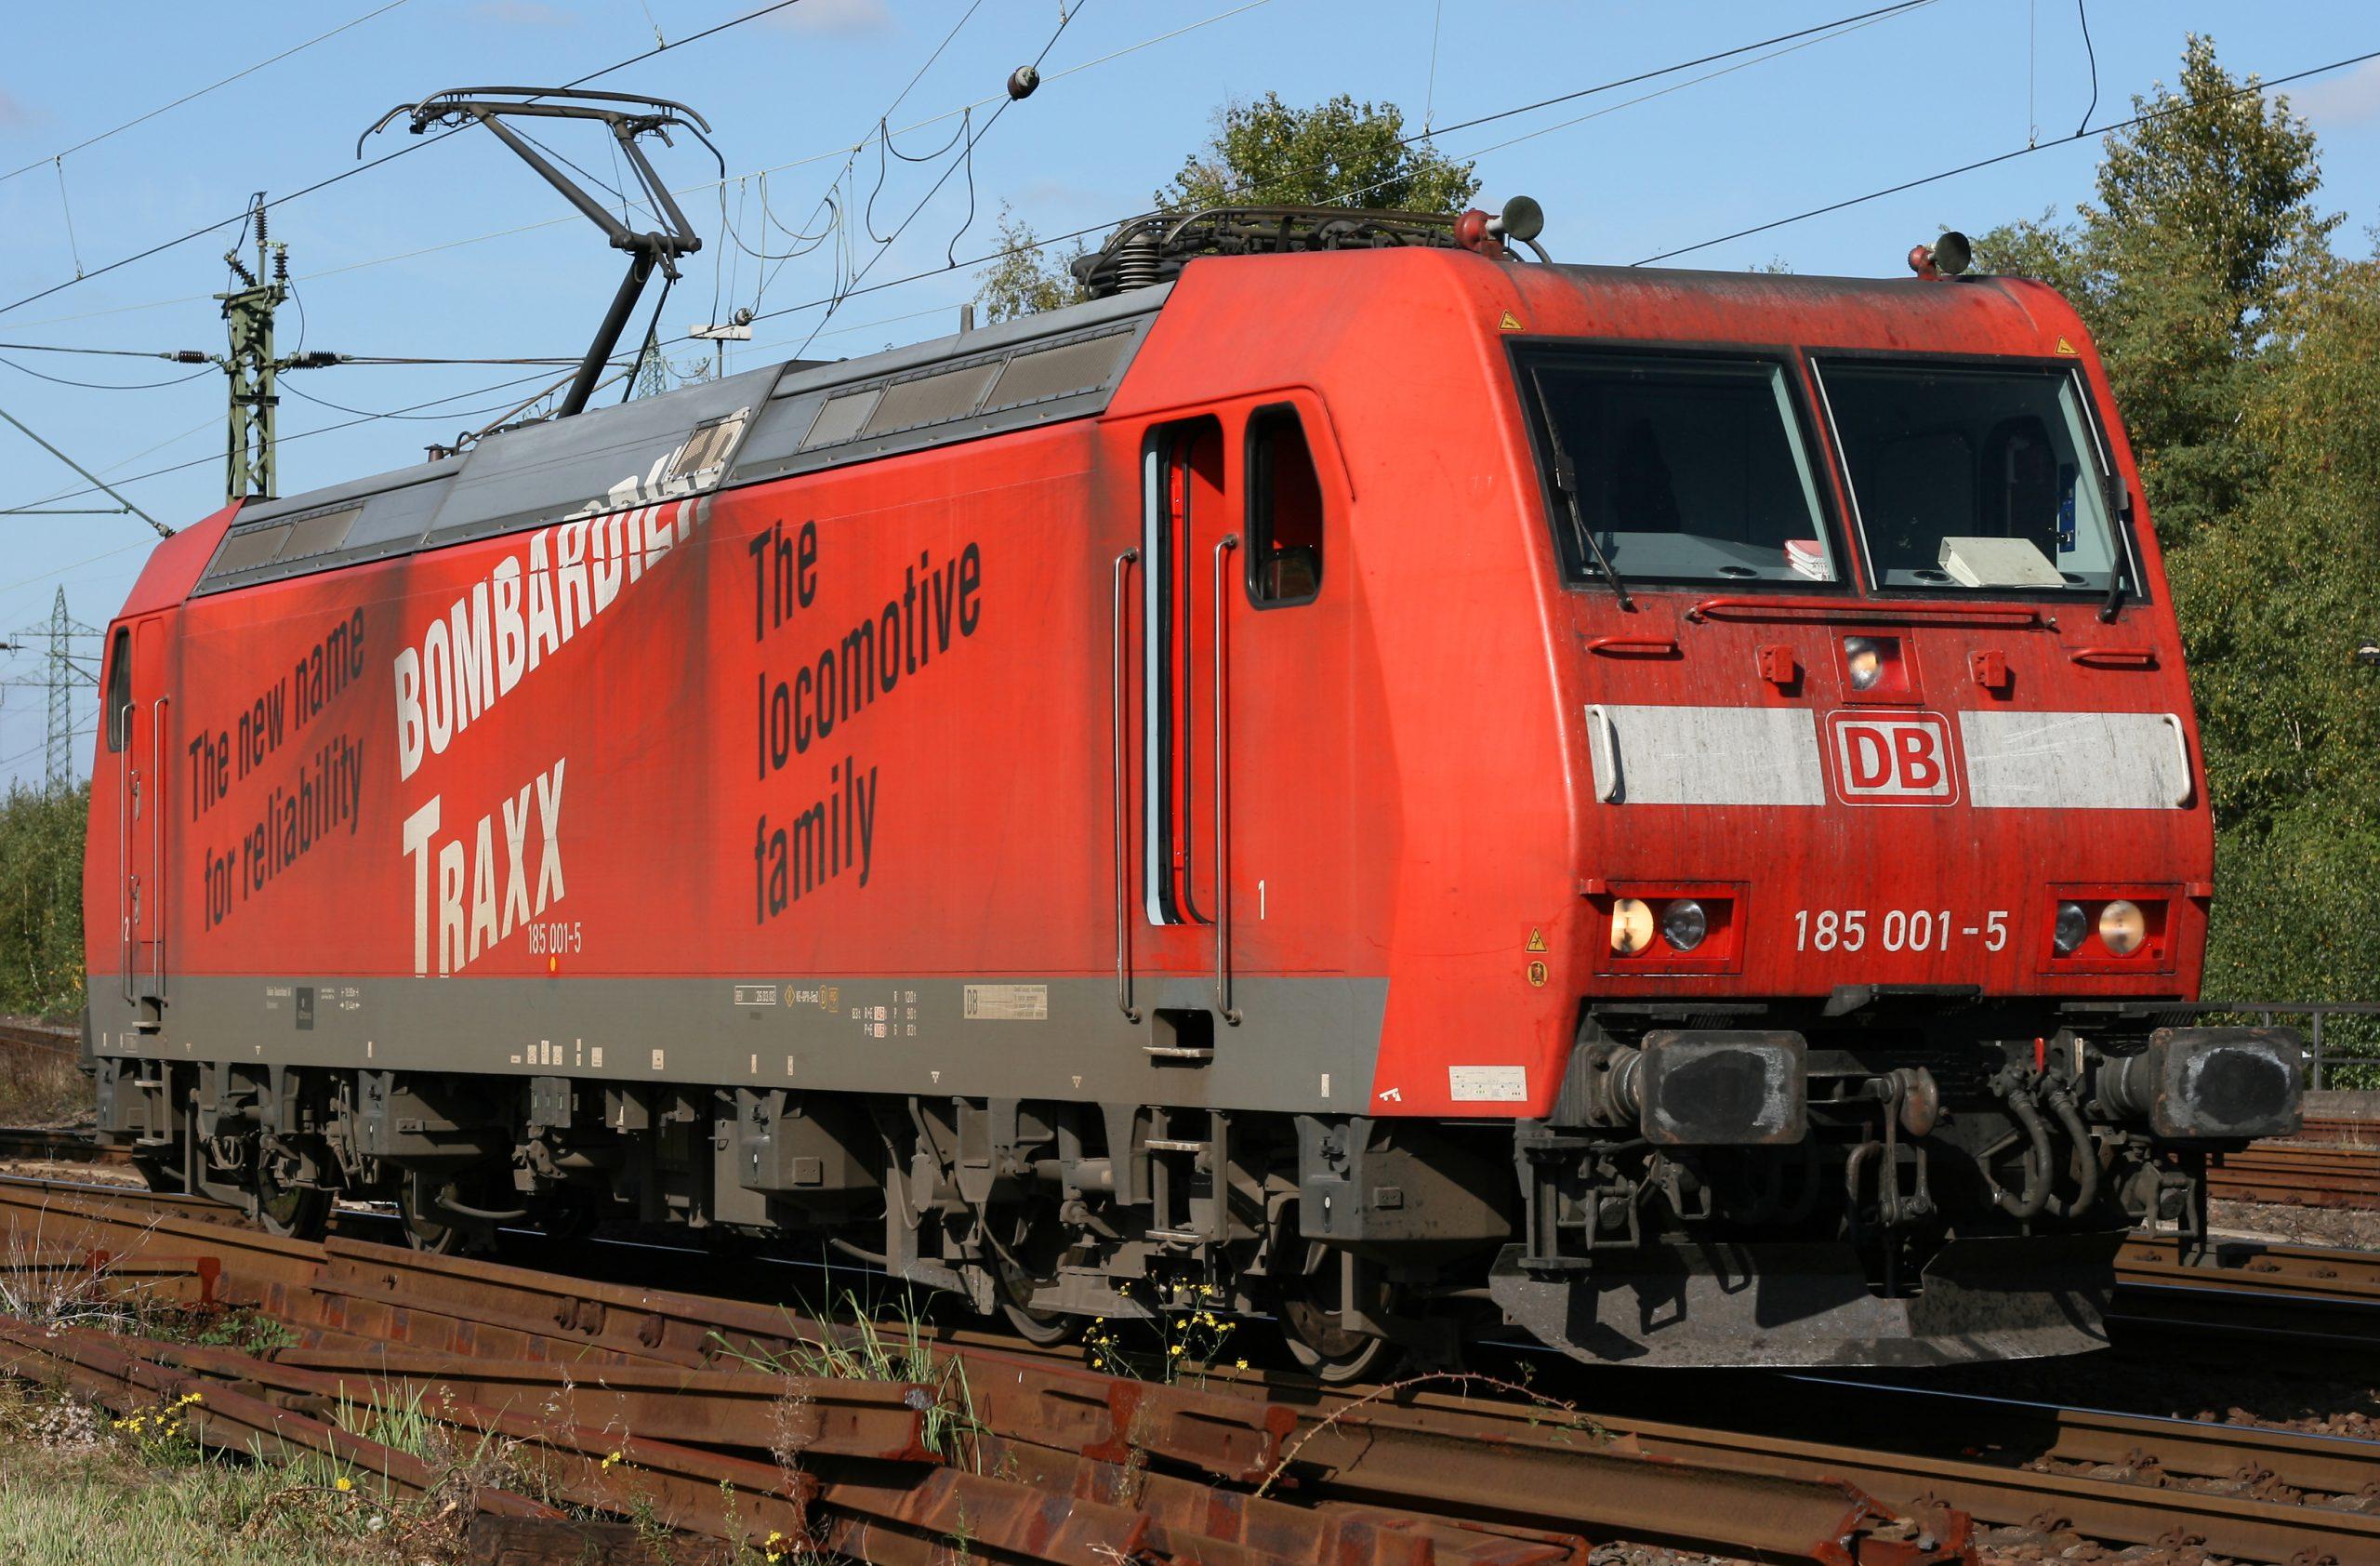 How to Convert DC Locomotive to DCC